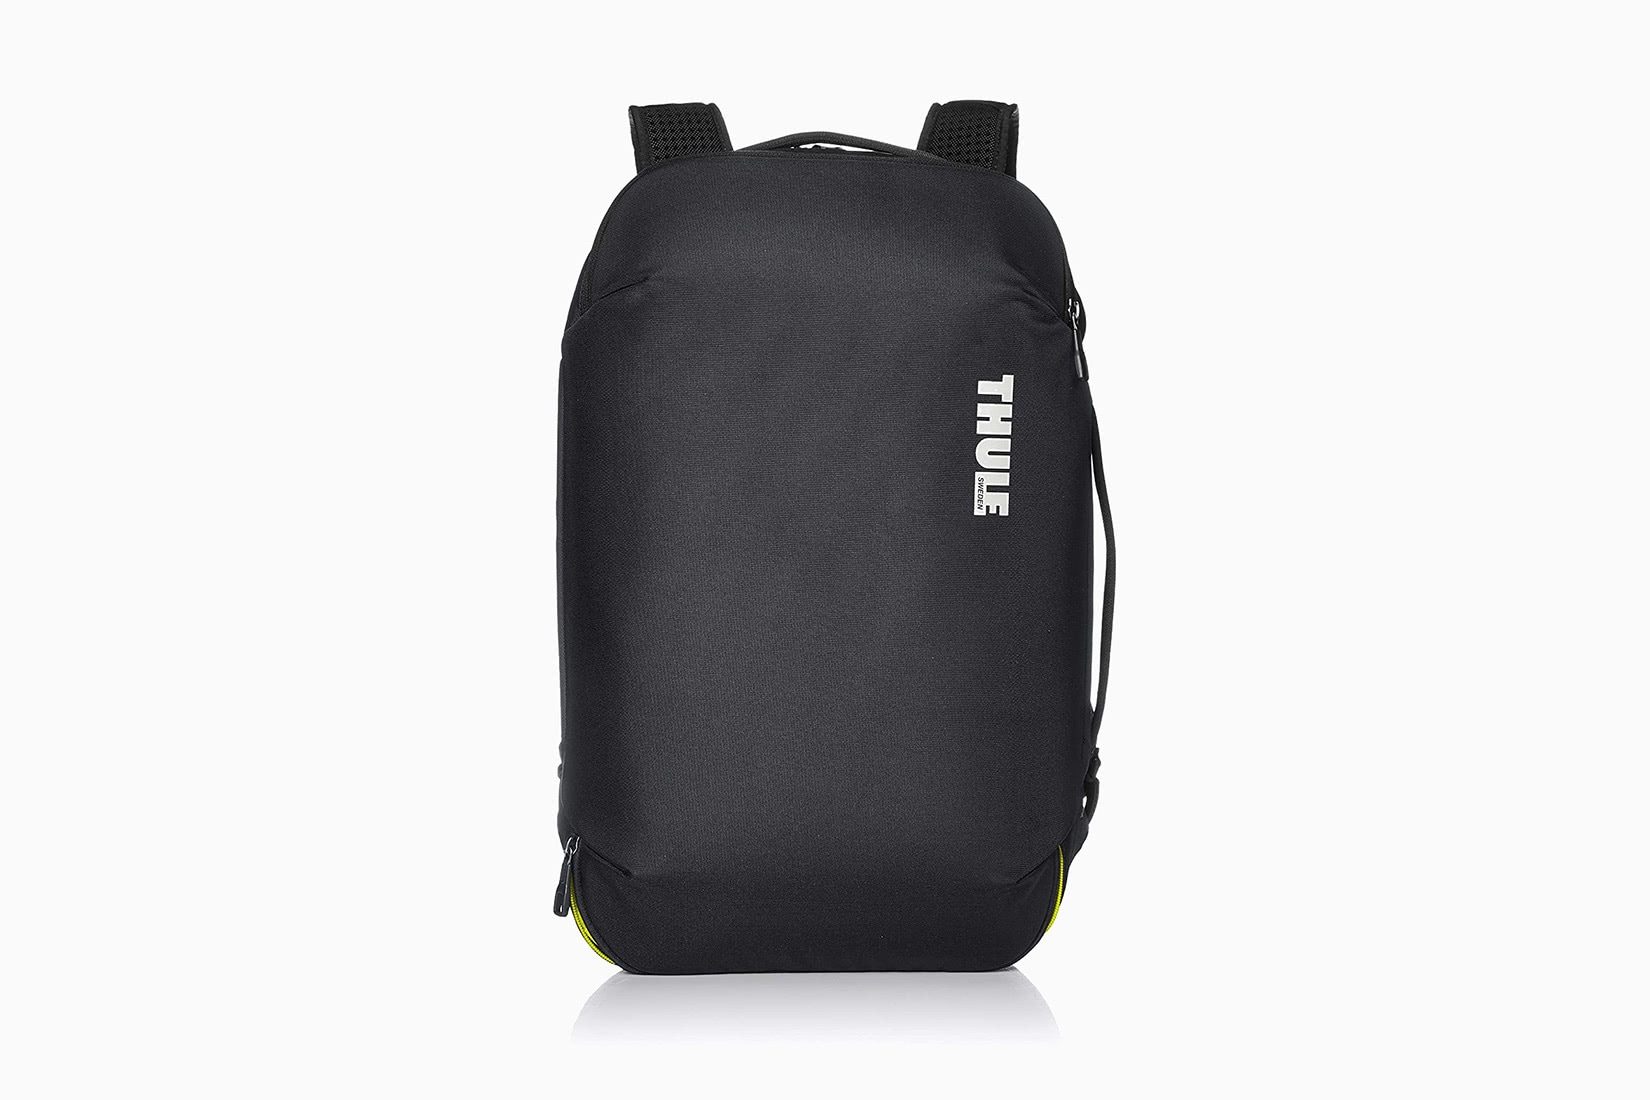 best duffel bags thule subterra convertible - Luxe Digital